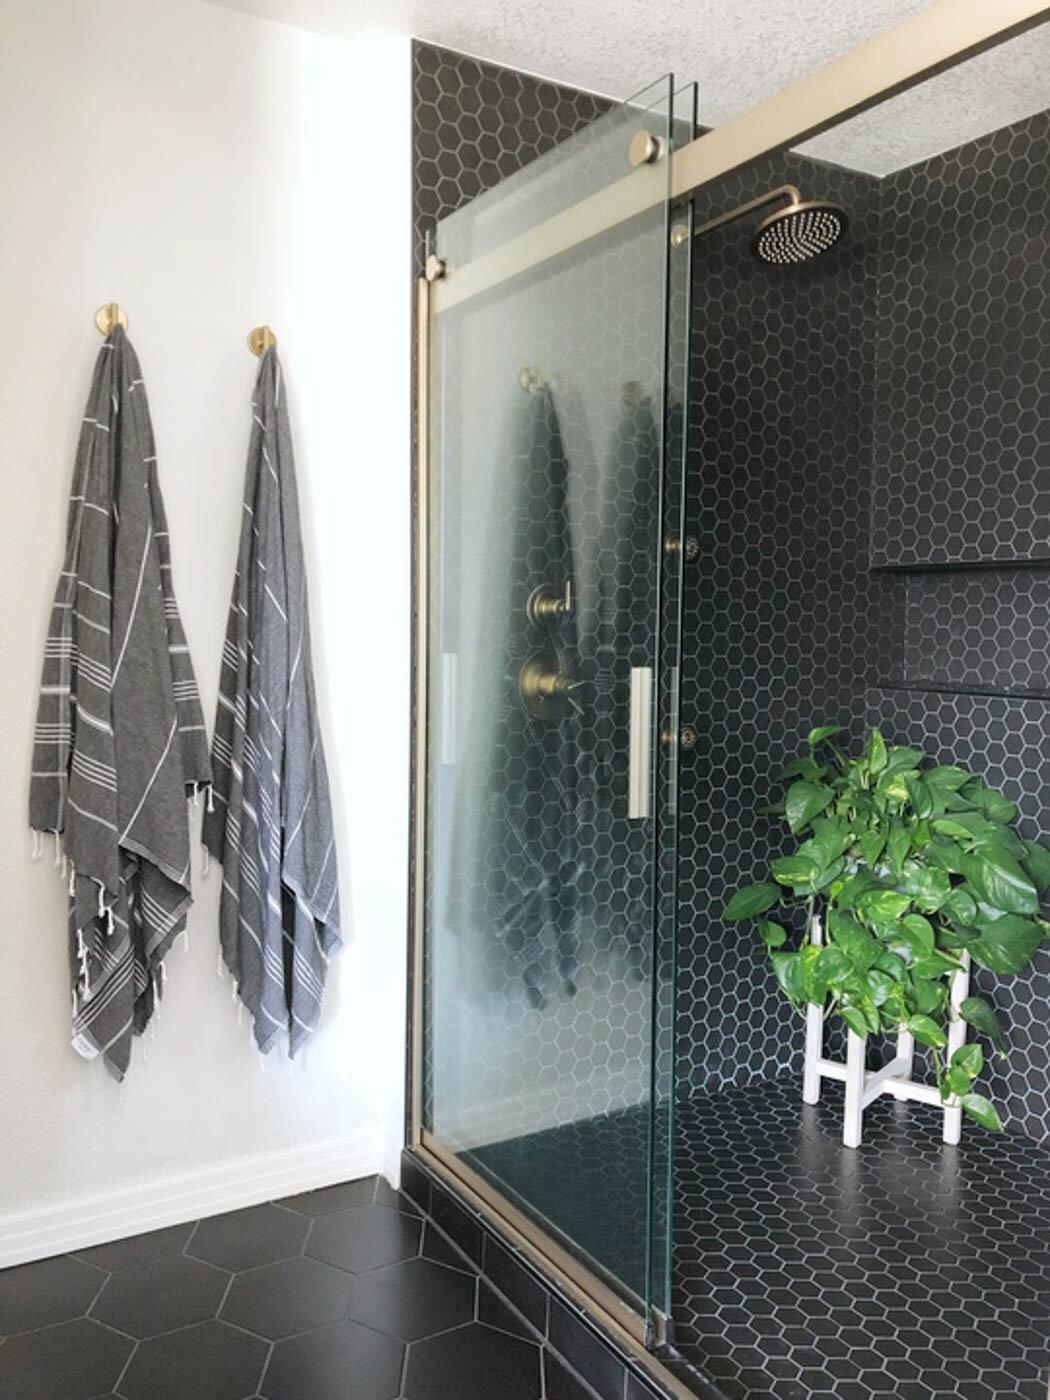 MinimalCharm-DenverCO-natural-light-photography-studio-lifestyle-photoshoot-location-editorial-commercial-photography-43.jpg